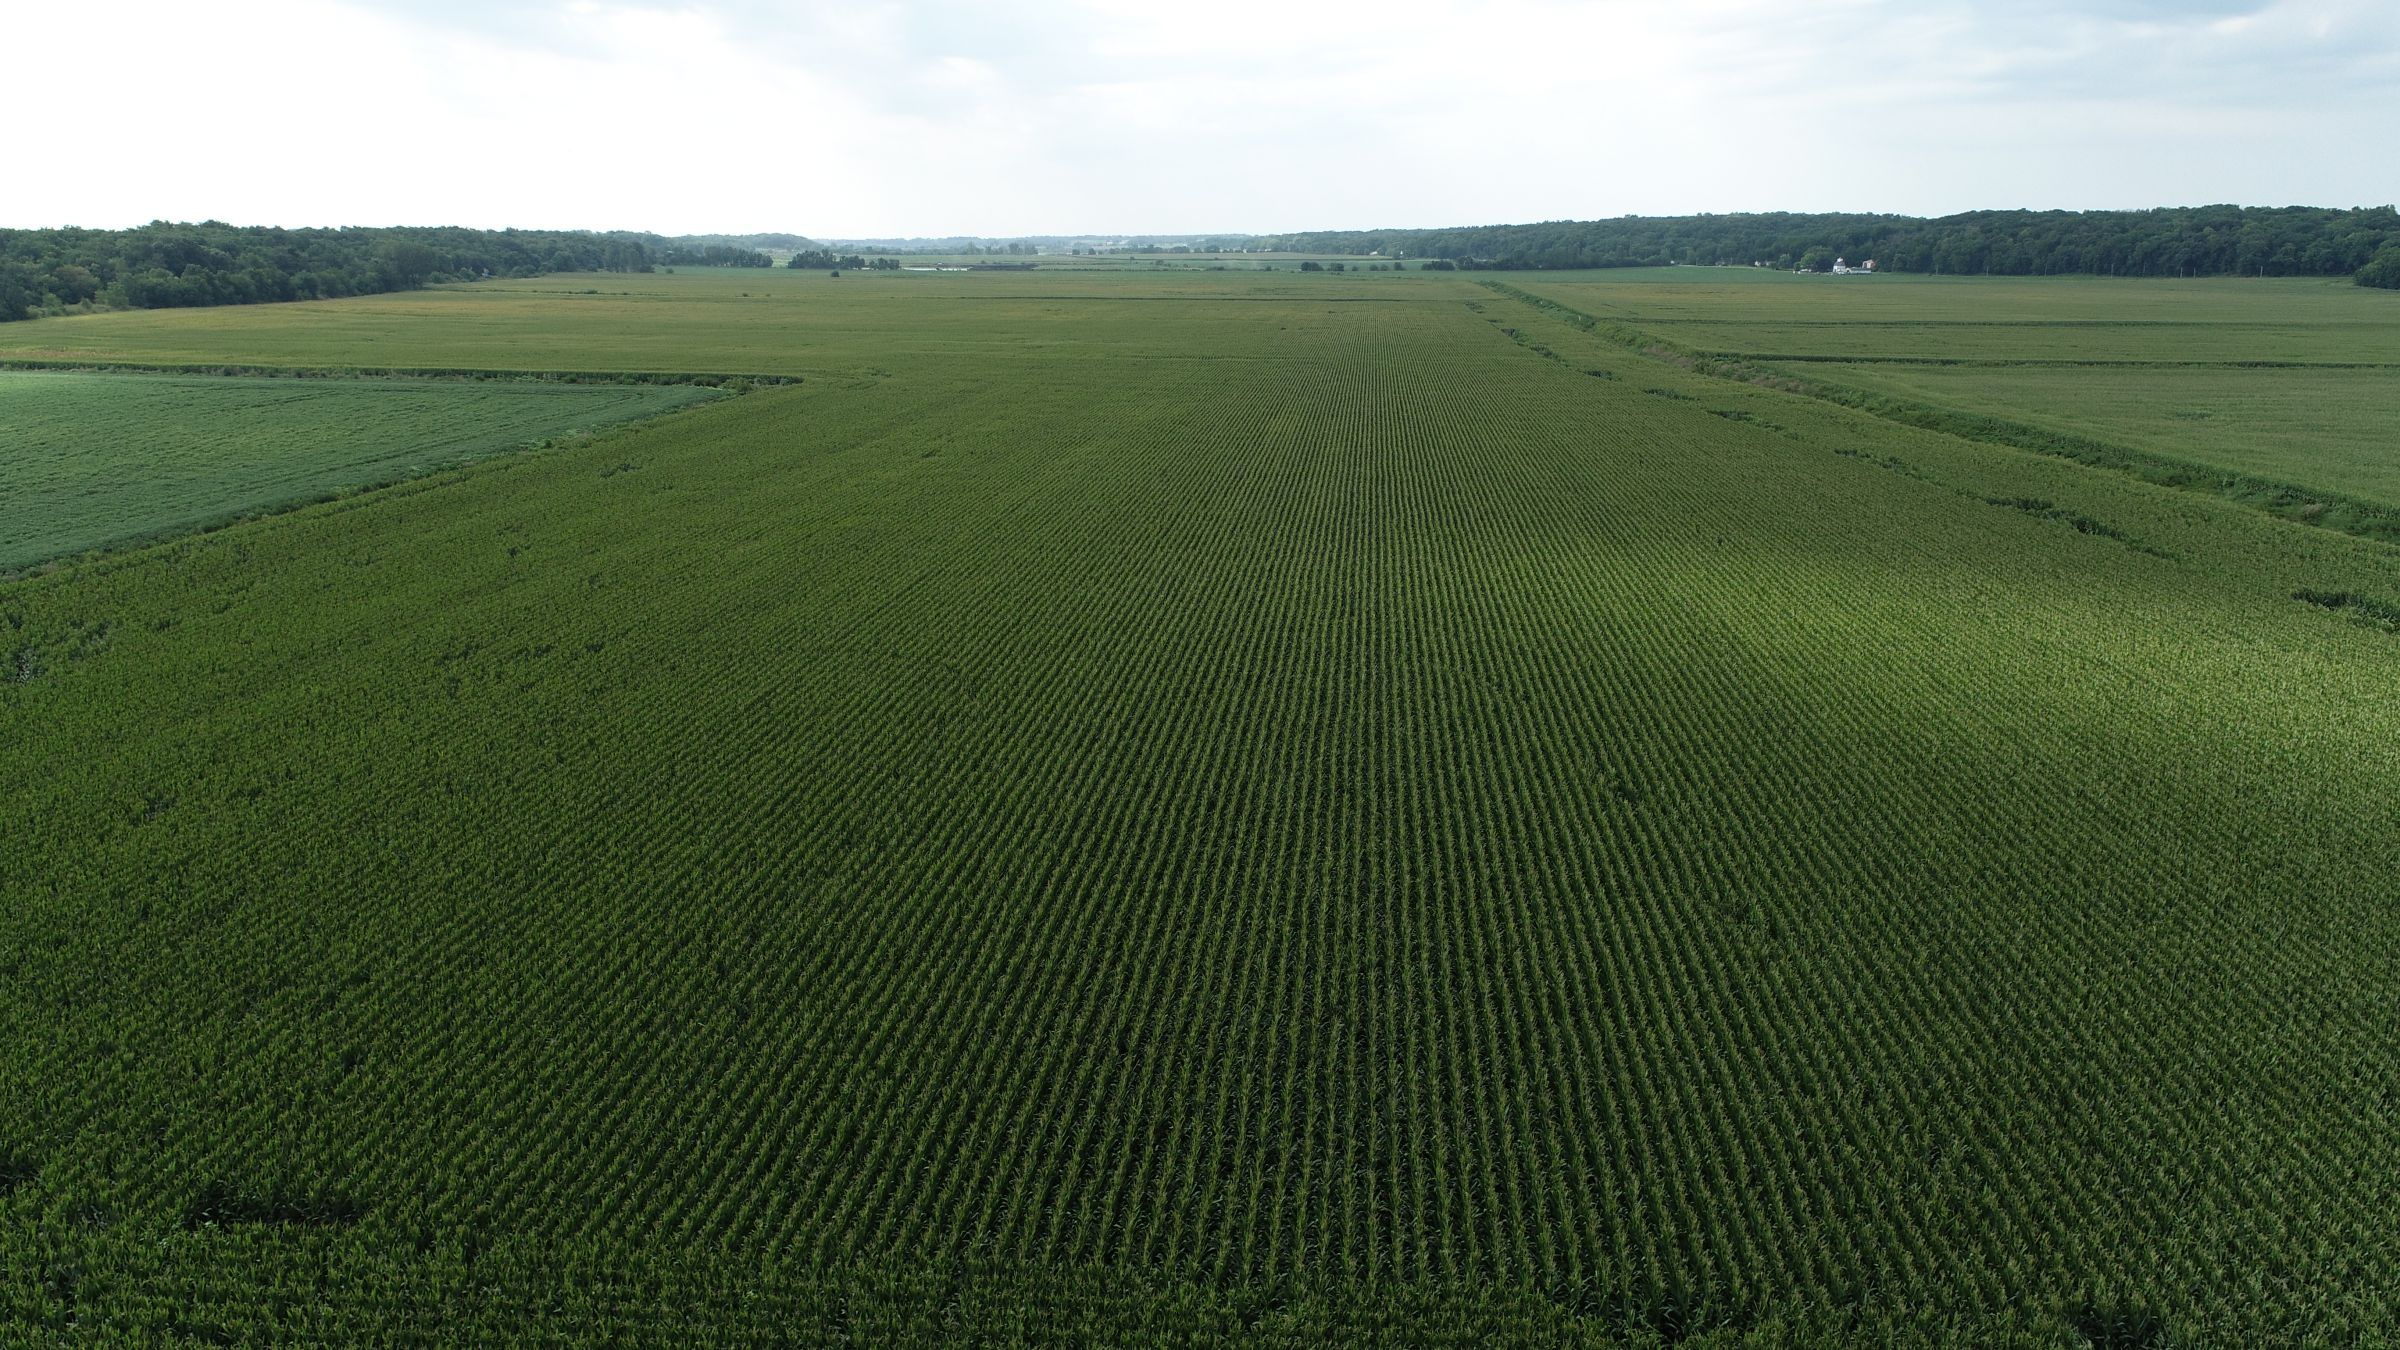 land-whiteside-county-illinois-146-acres-listing-number-15705-3-2021-08-27-180502.JPG